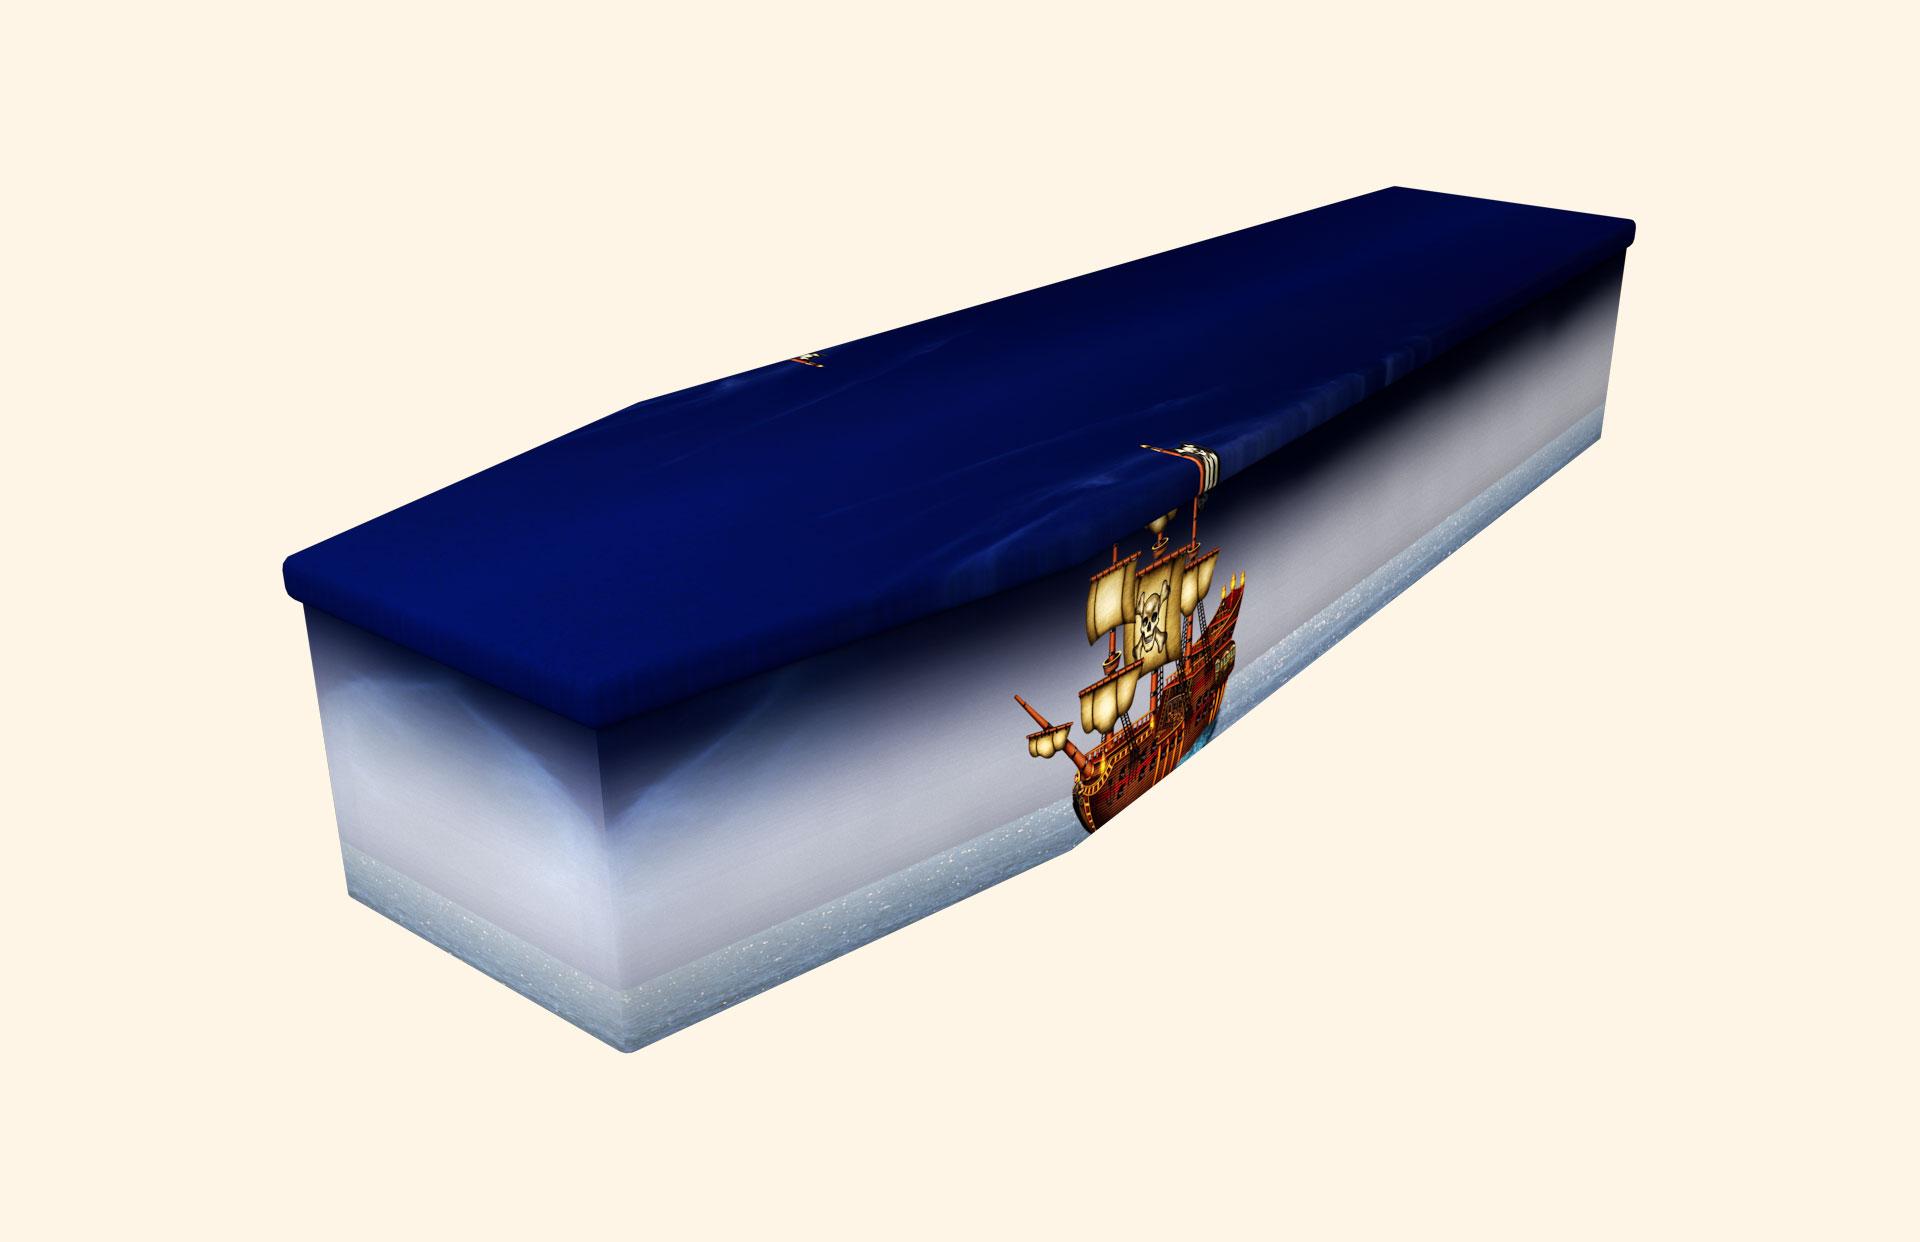 Pirate Ship Cardboard coffin